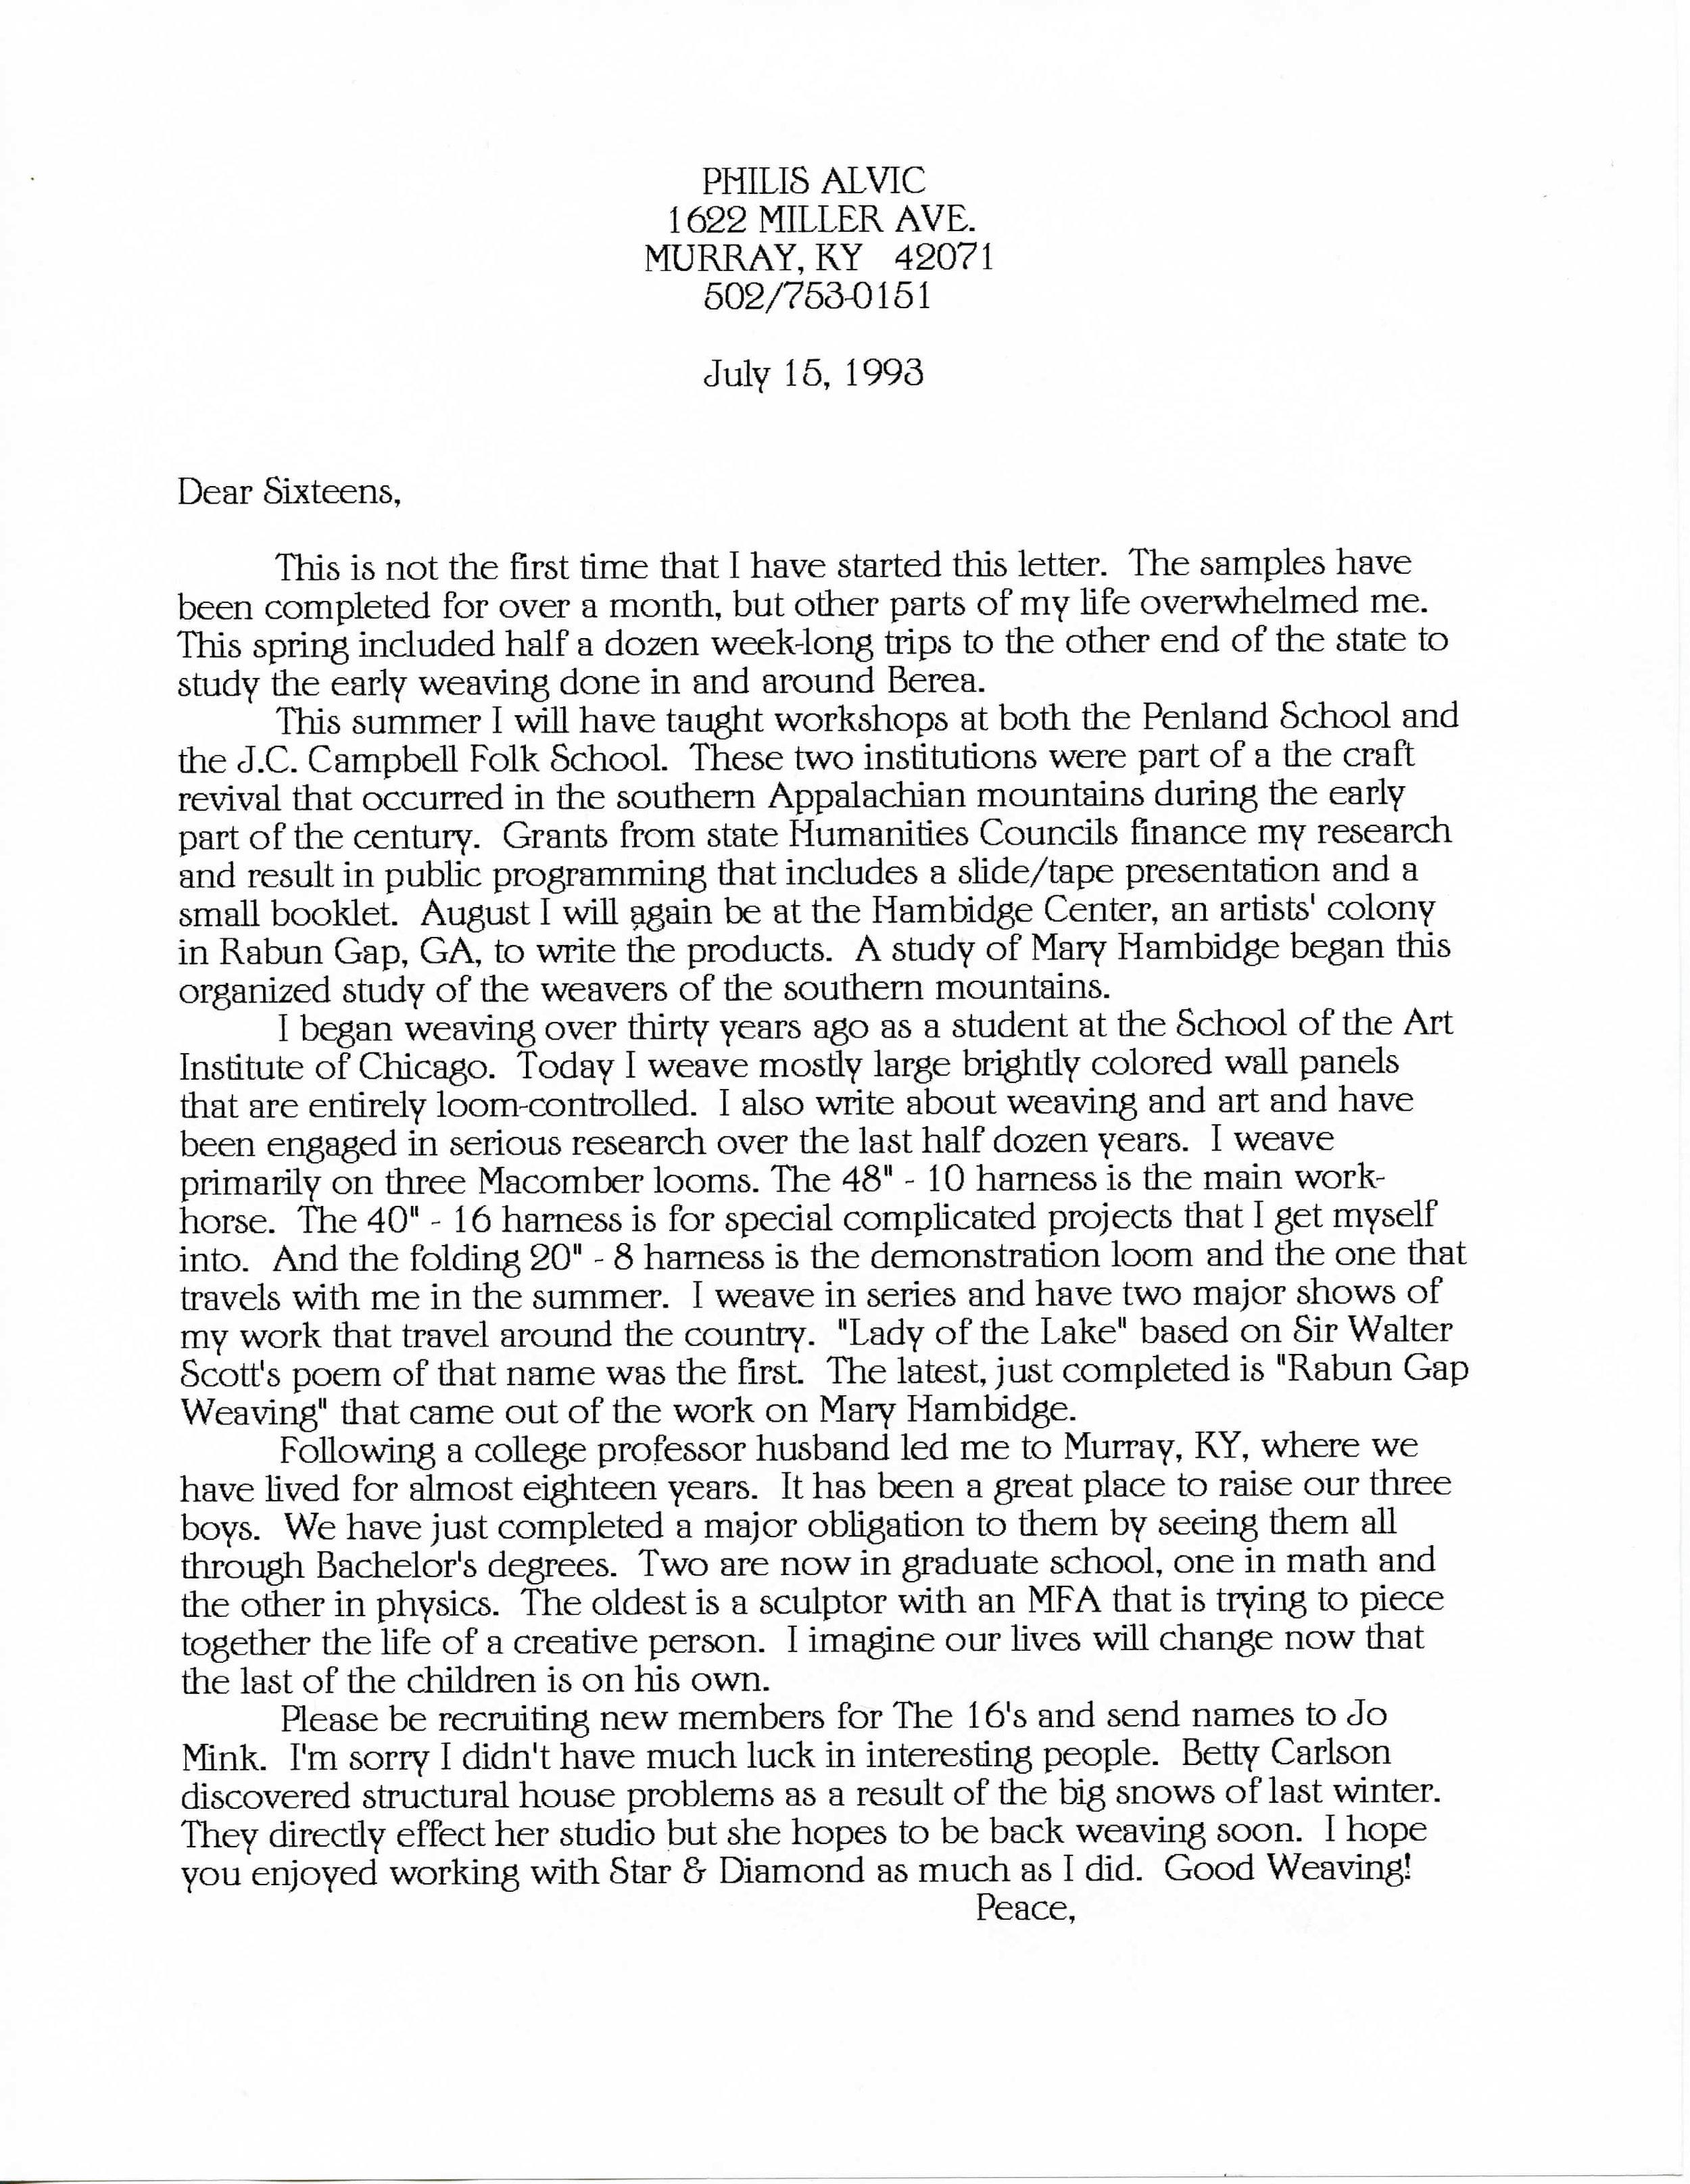 1993_Page_2_Image_0001.jpg